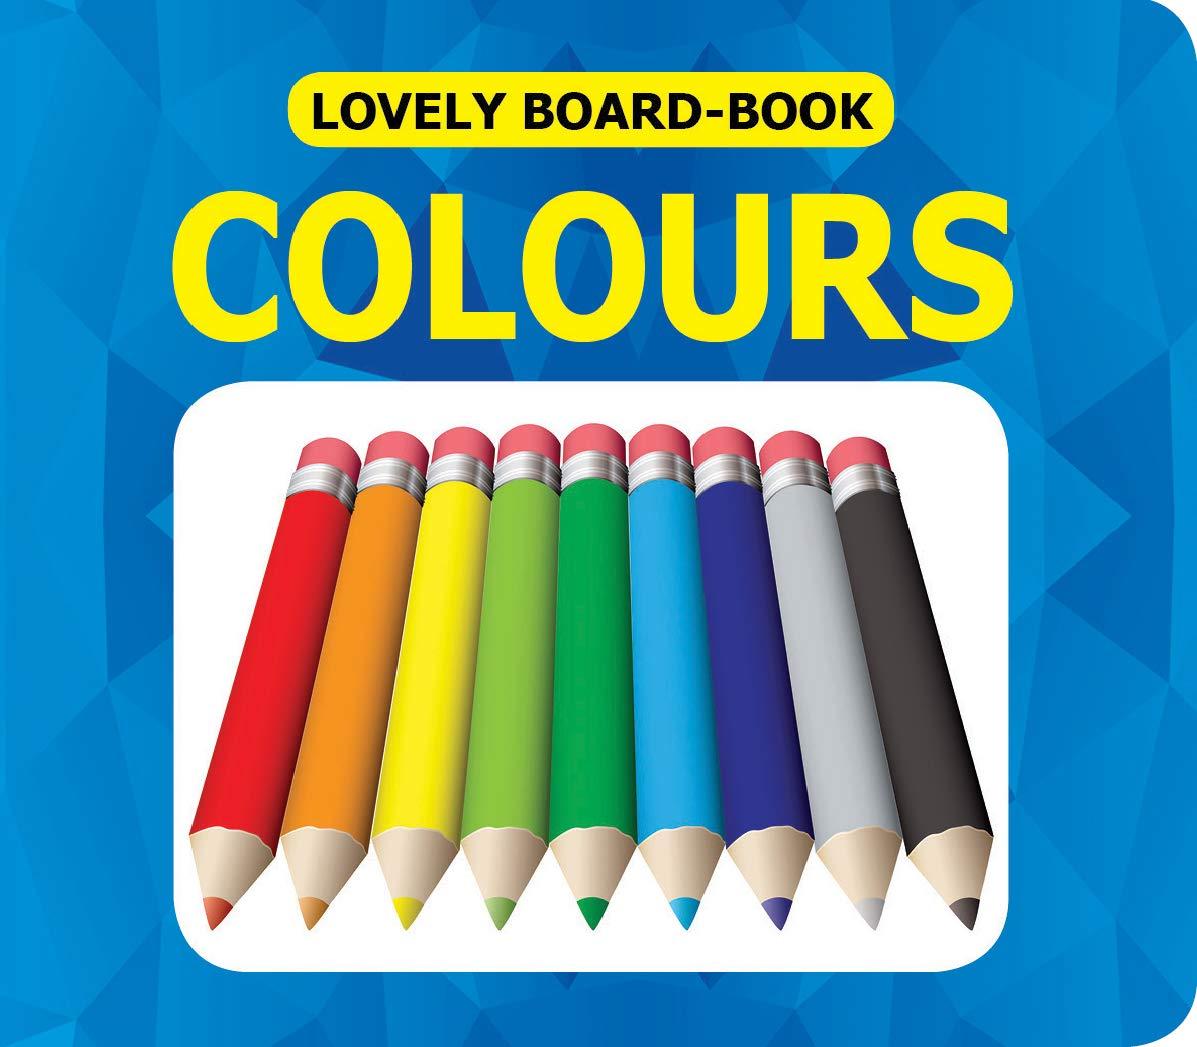 Lovely Board Books - Colours